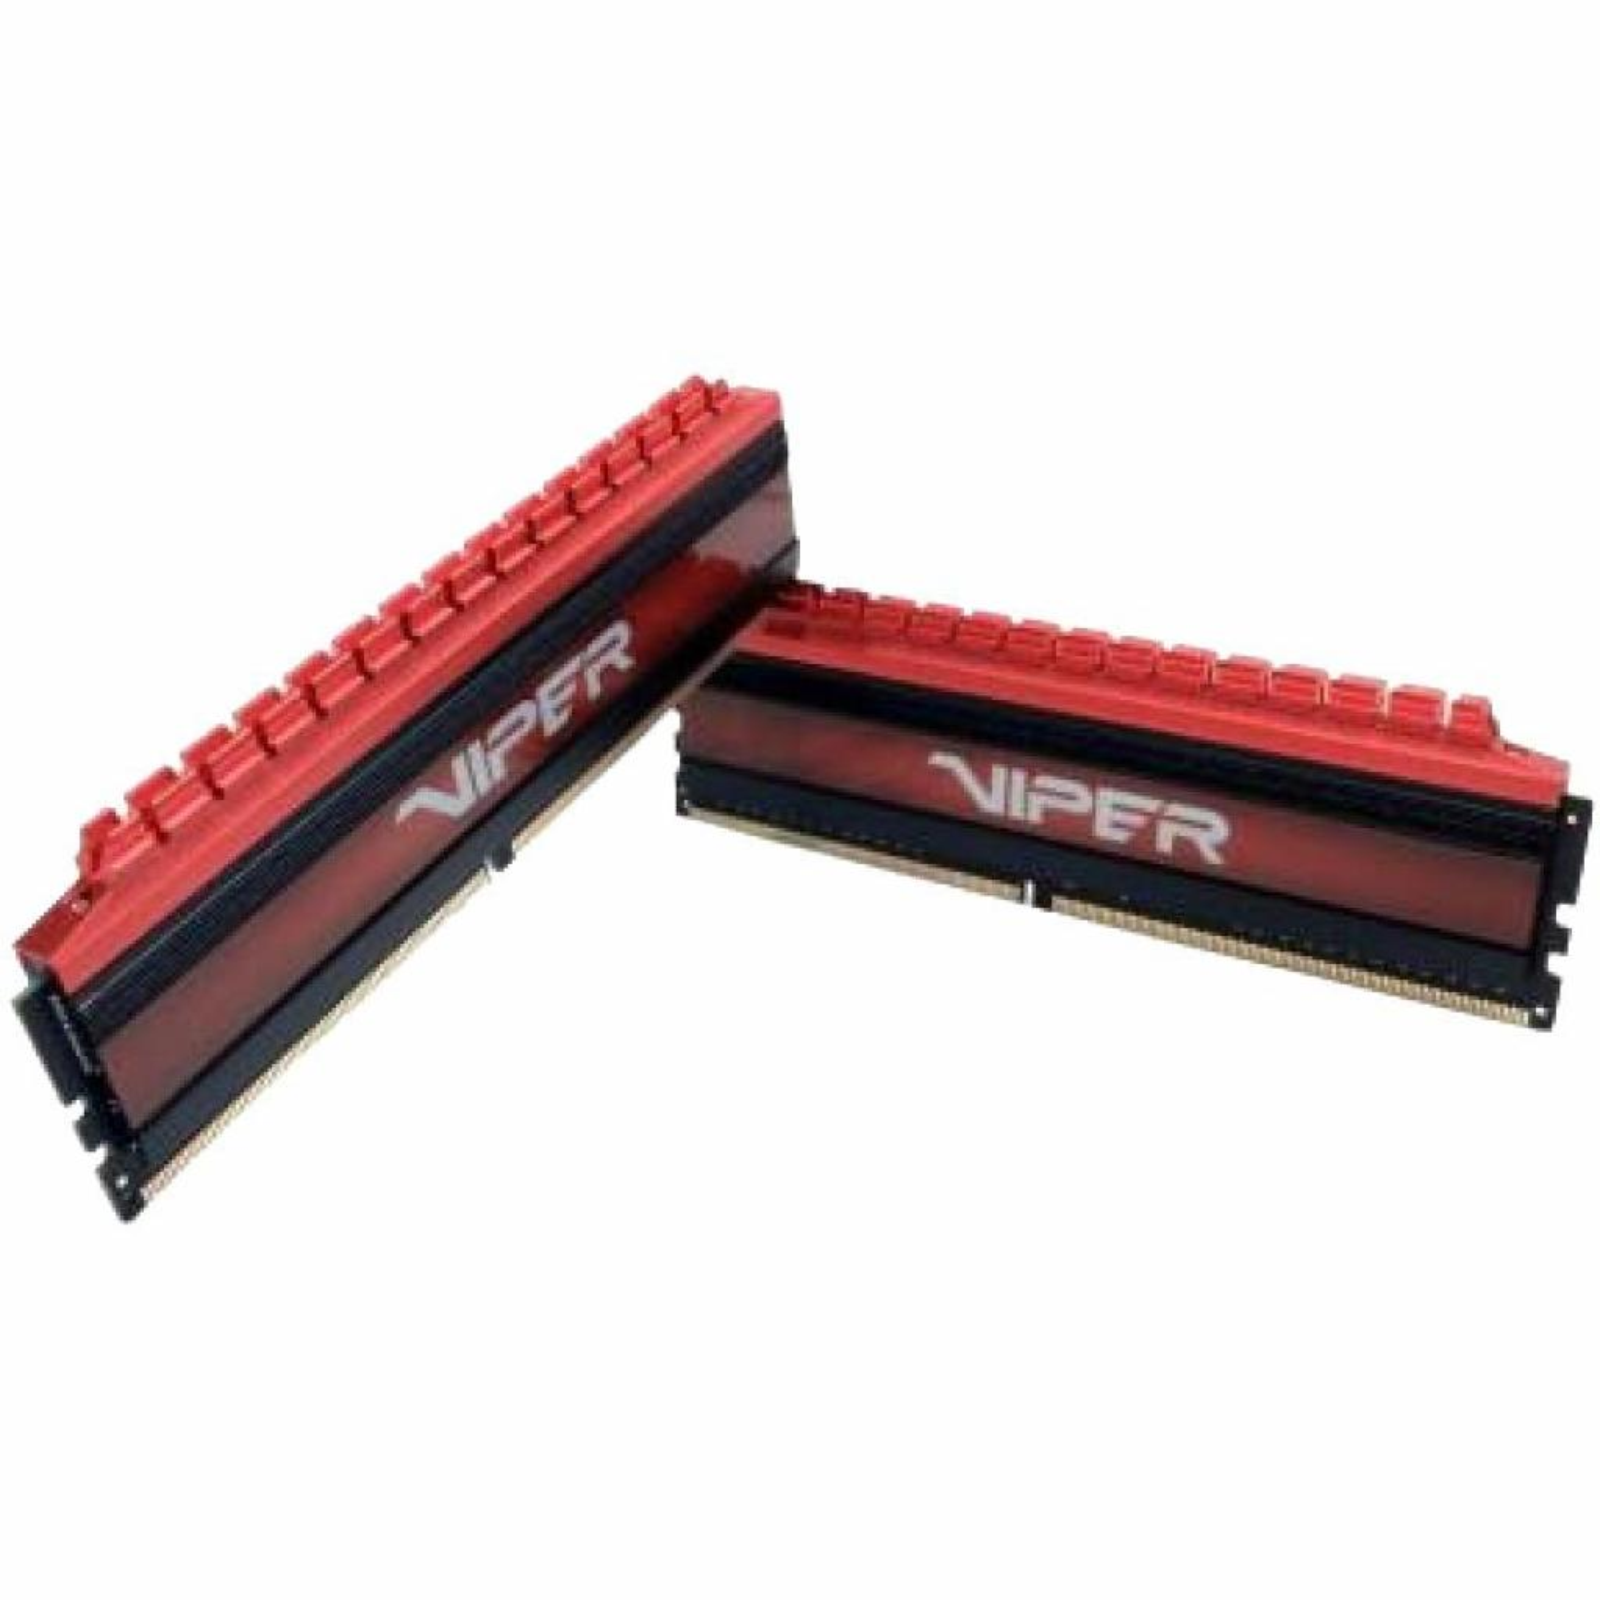 Модуль памяти для компьютера DDR4 8GB (2x4GB) 3200 MHz Viper 4 Red Patriot (PV48G320C6K) изображение 2